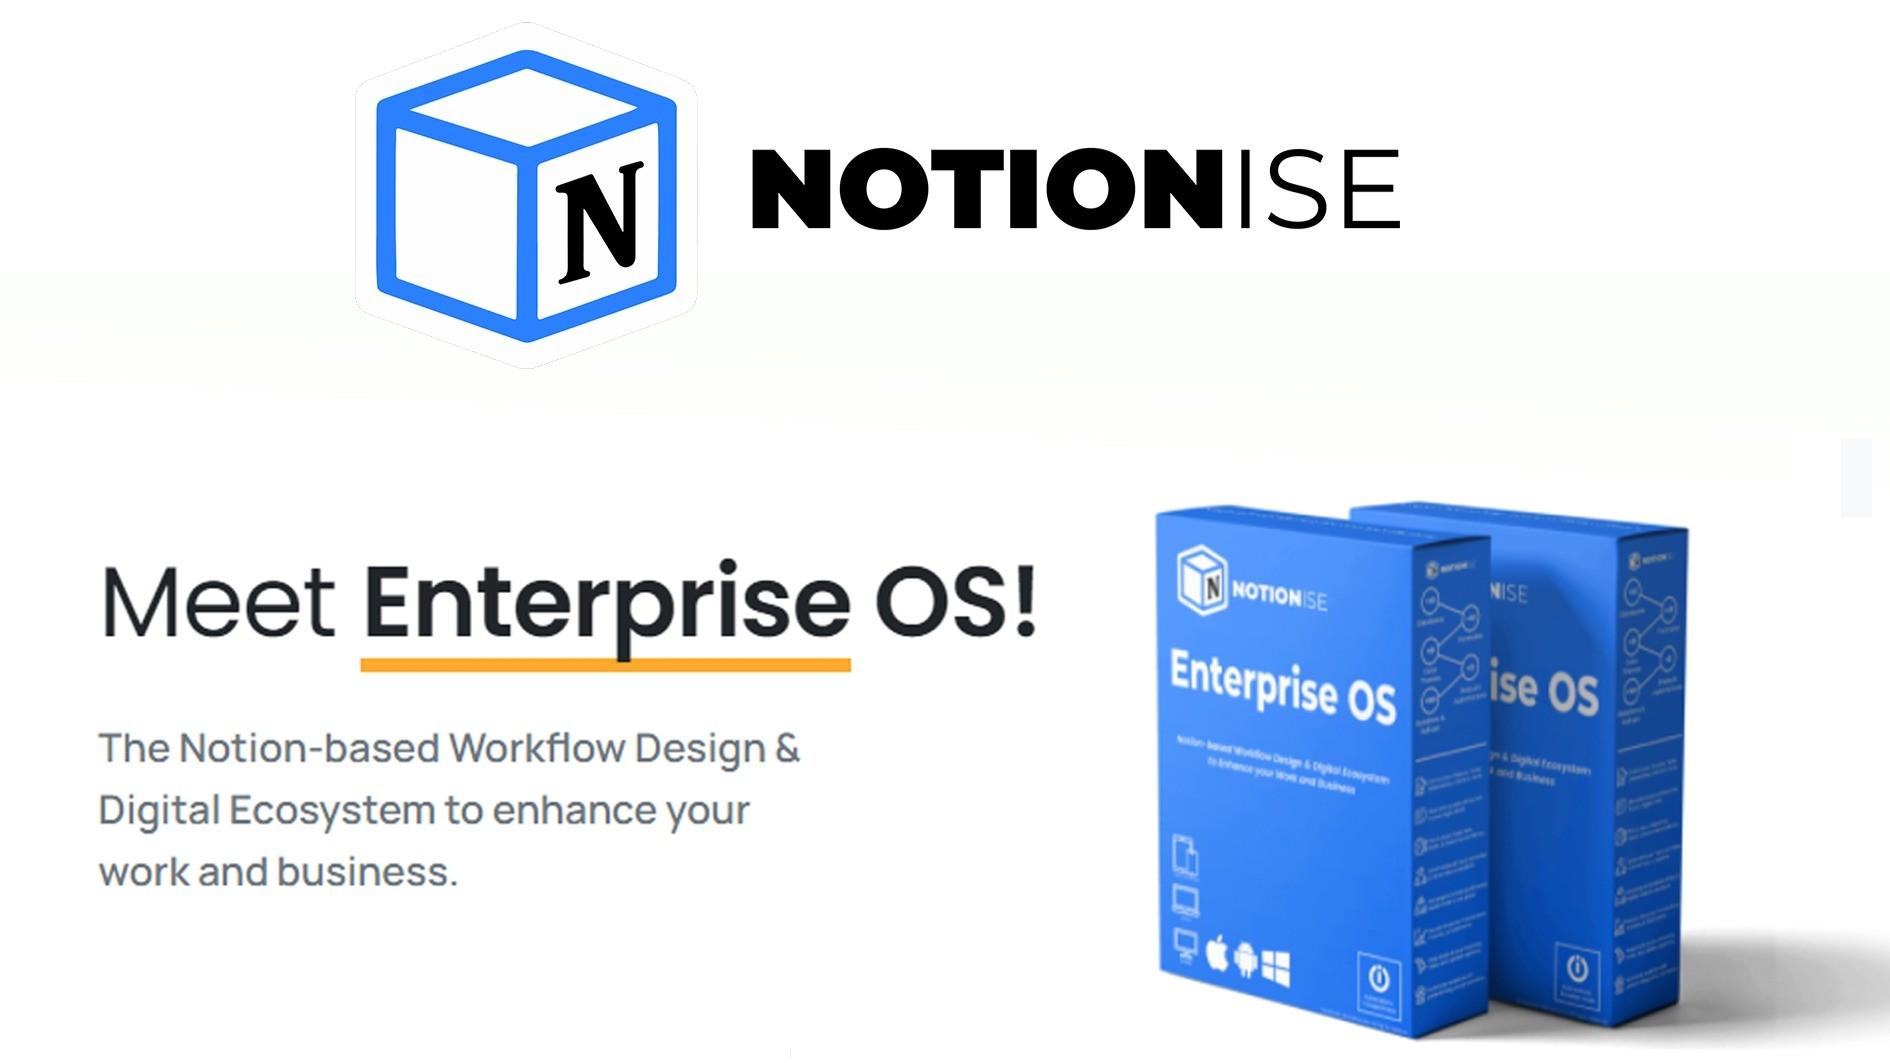 AppSumo Deal for Enterprise OS